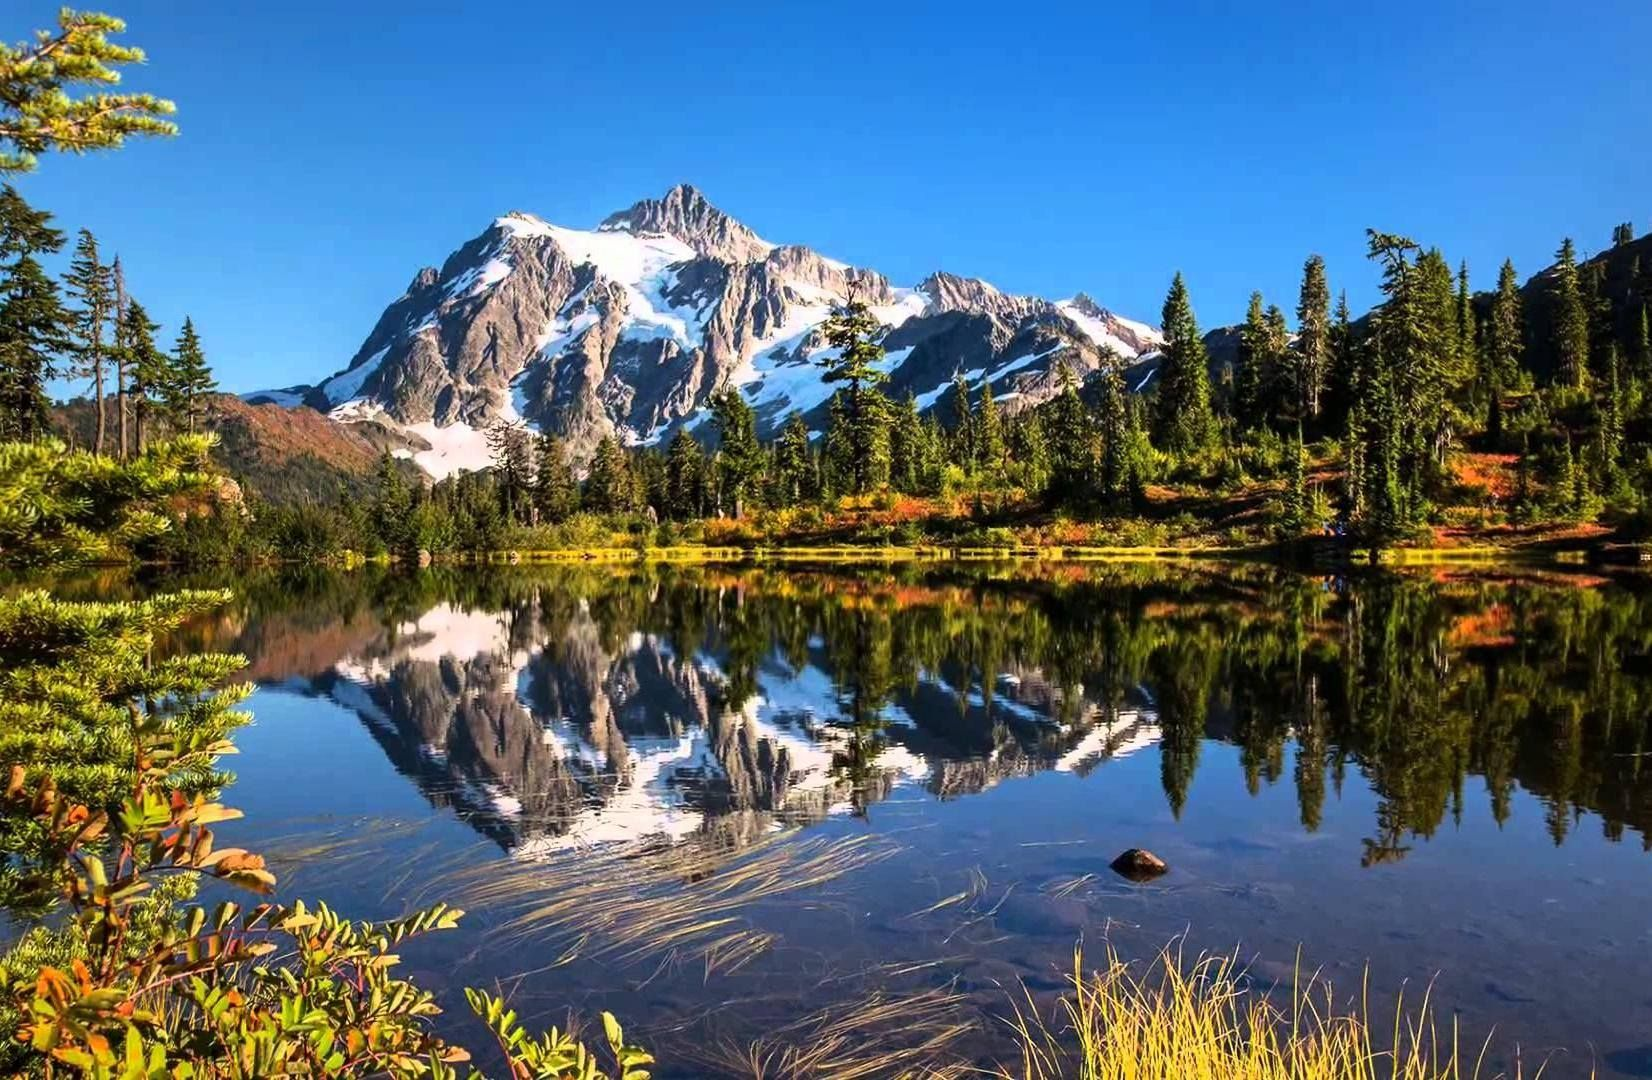 Monte Shuksan nel lago Highwood Heather Meadows, Mount Baker Wilderness, Washington,USA ©Ph.Ris